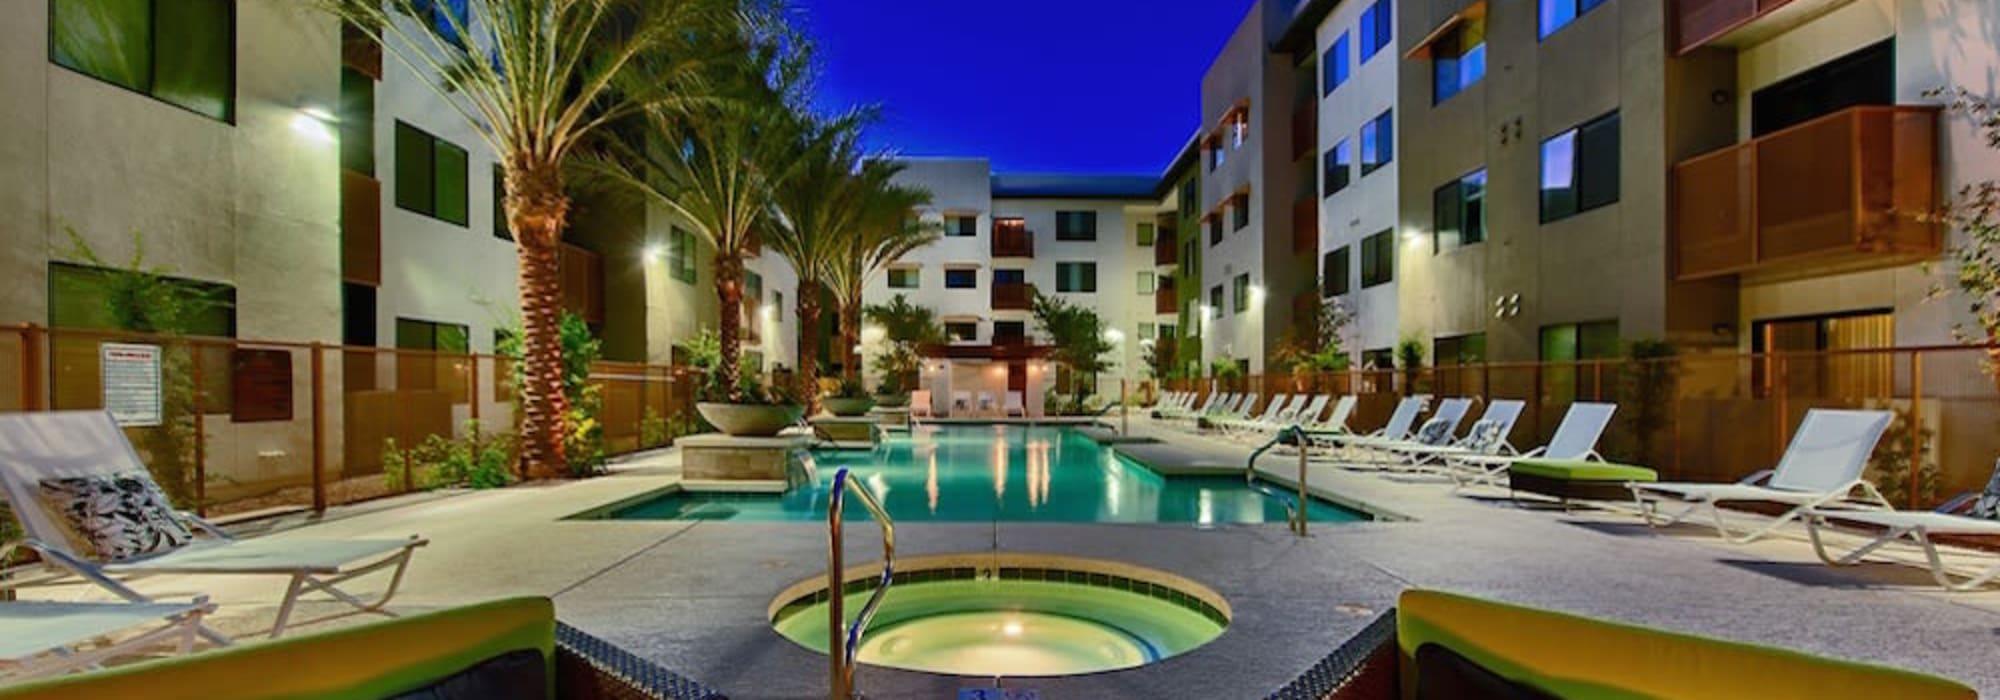 Pool hangout area at Cactus Forty-2 in Phoenix, Arizona